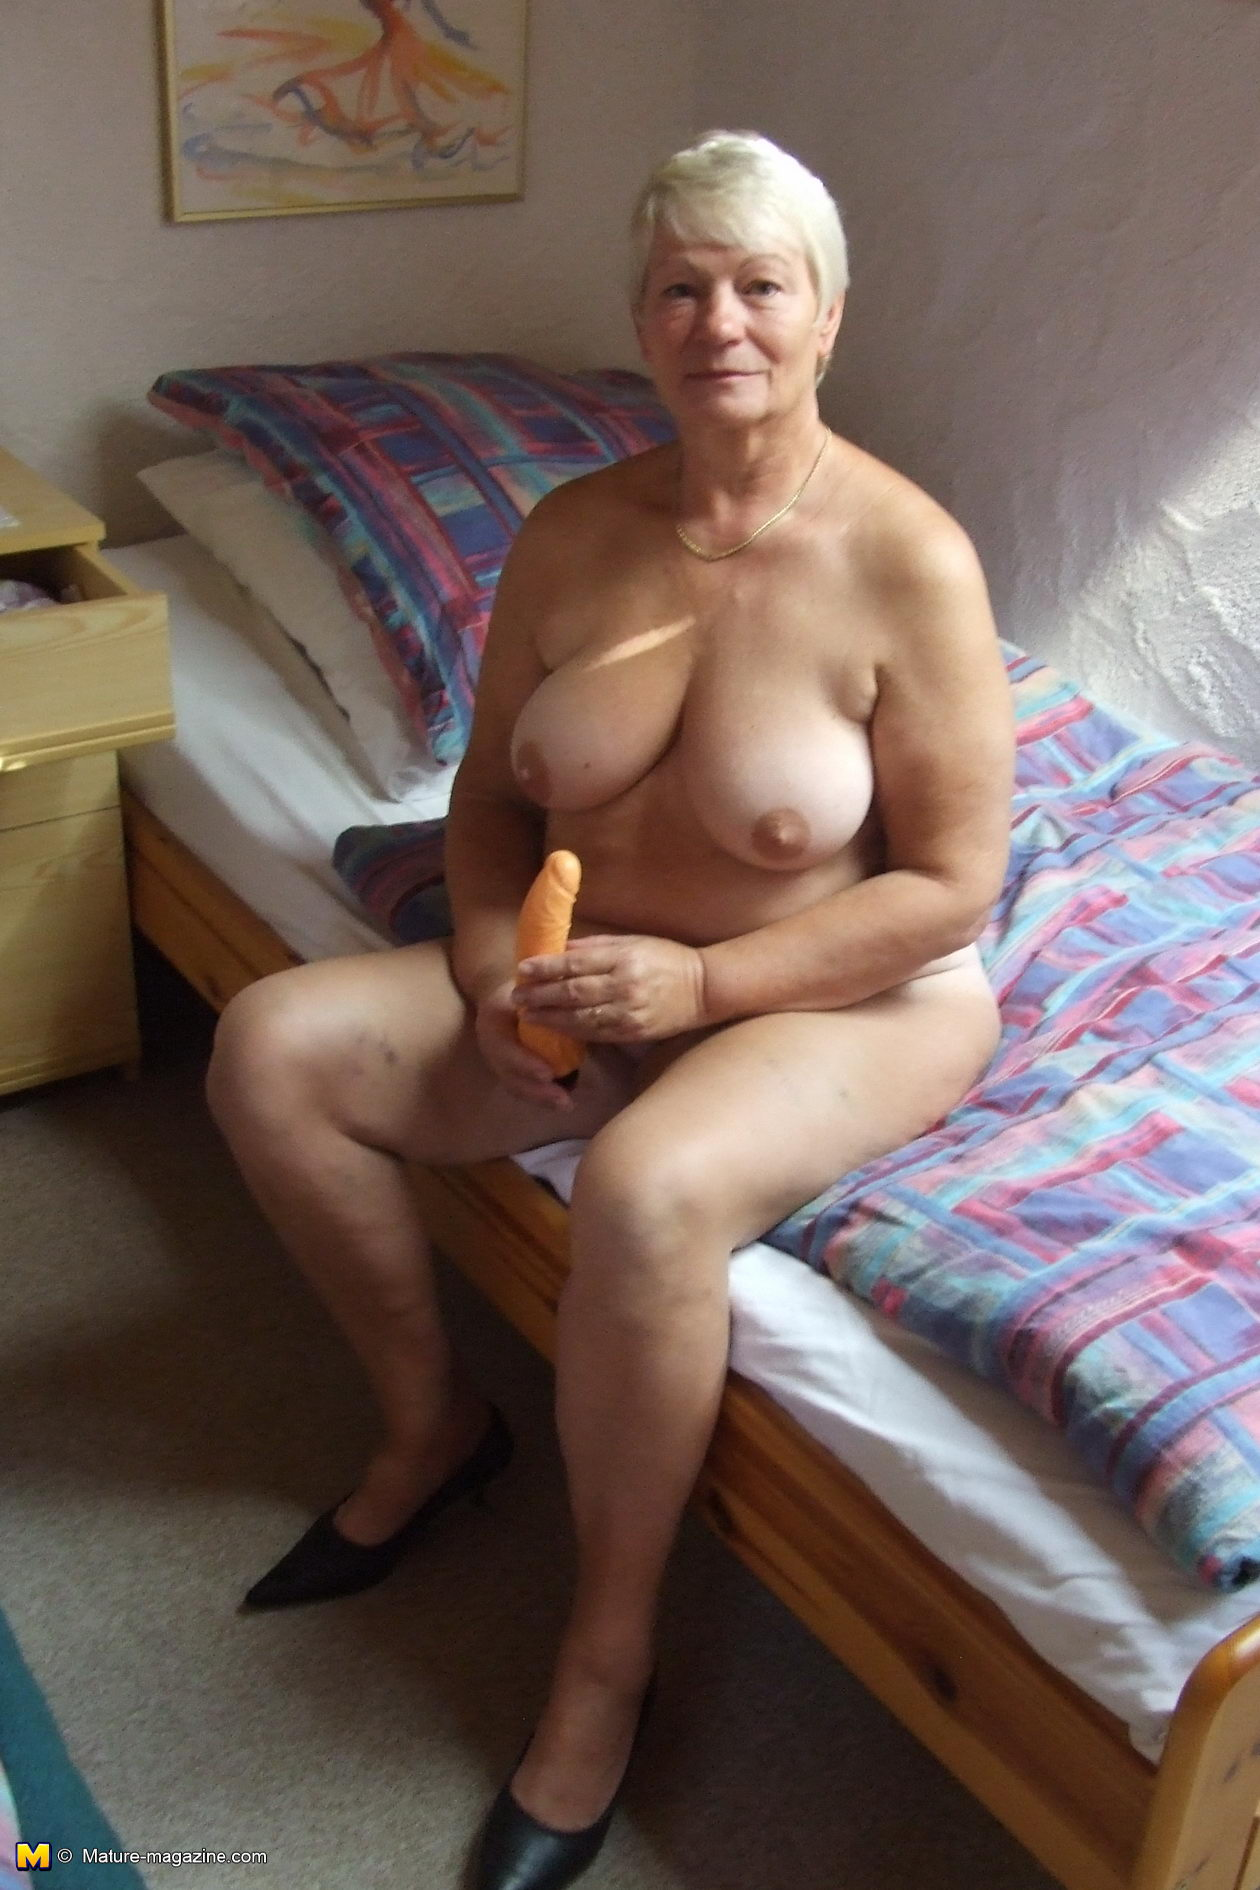 Free lebnan girl porn virgin